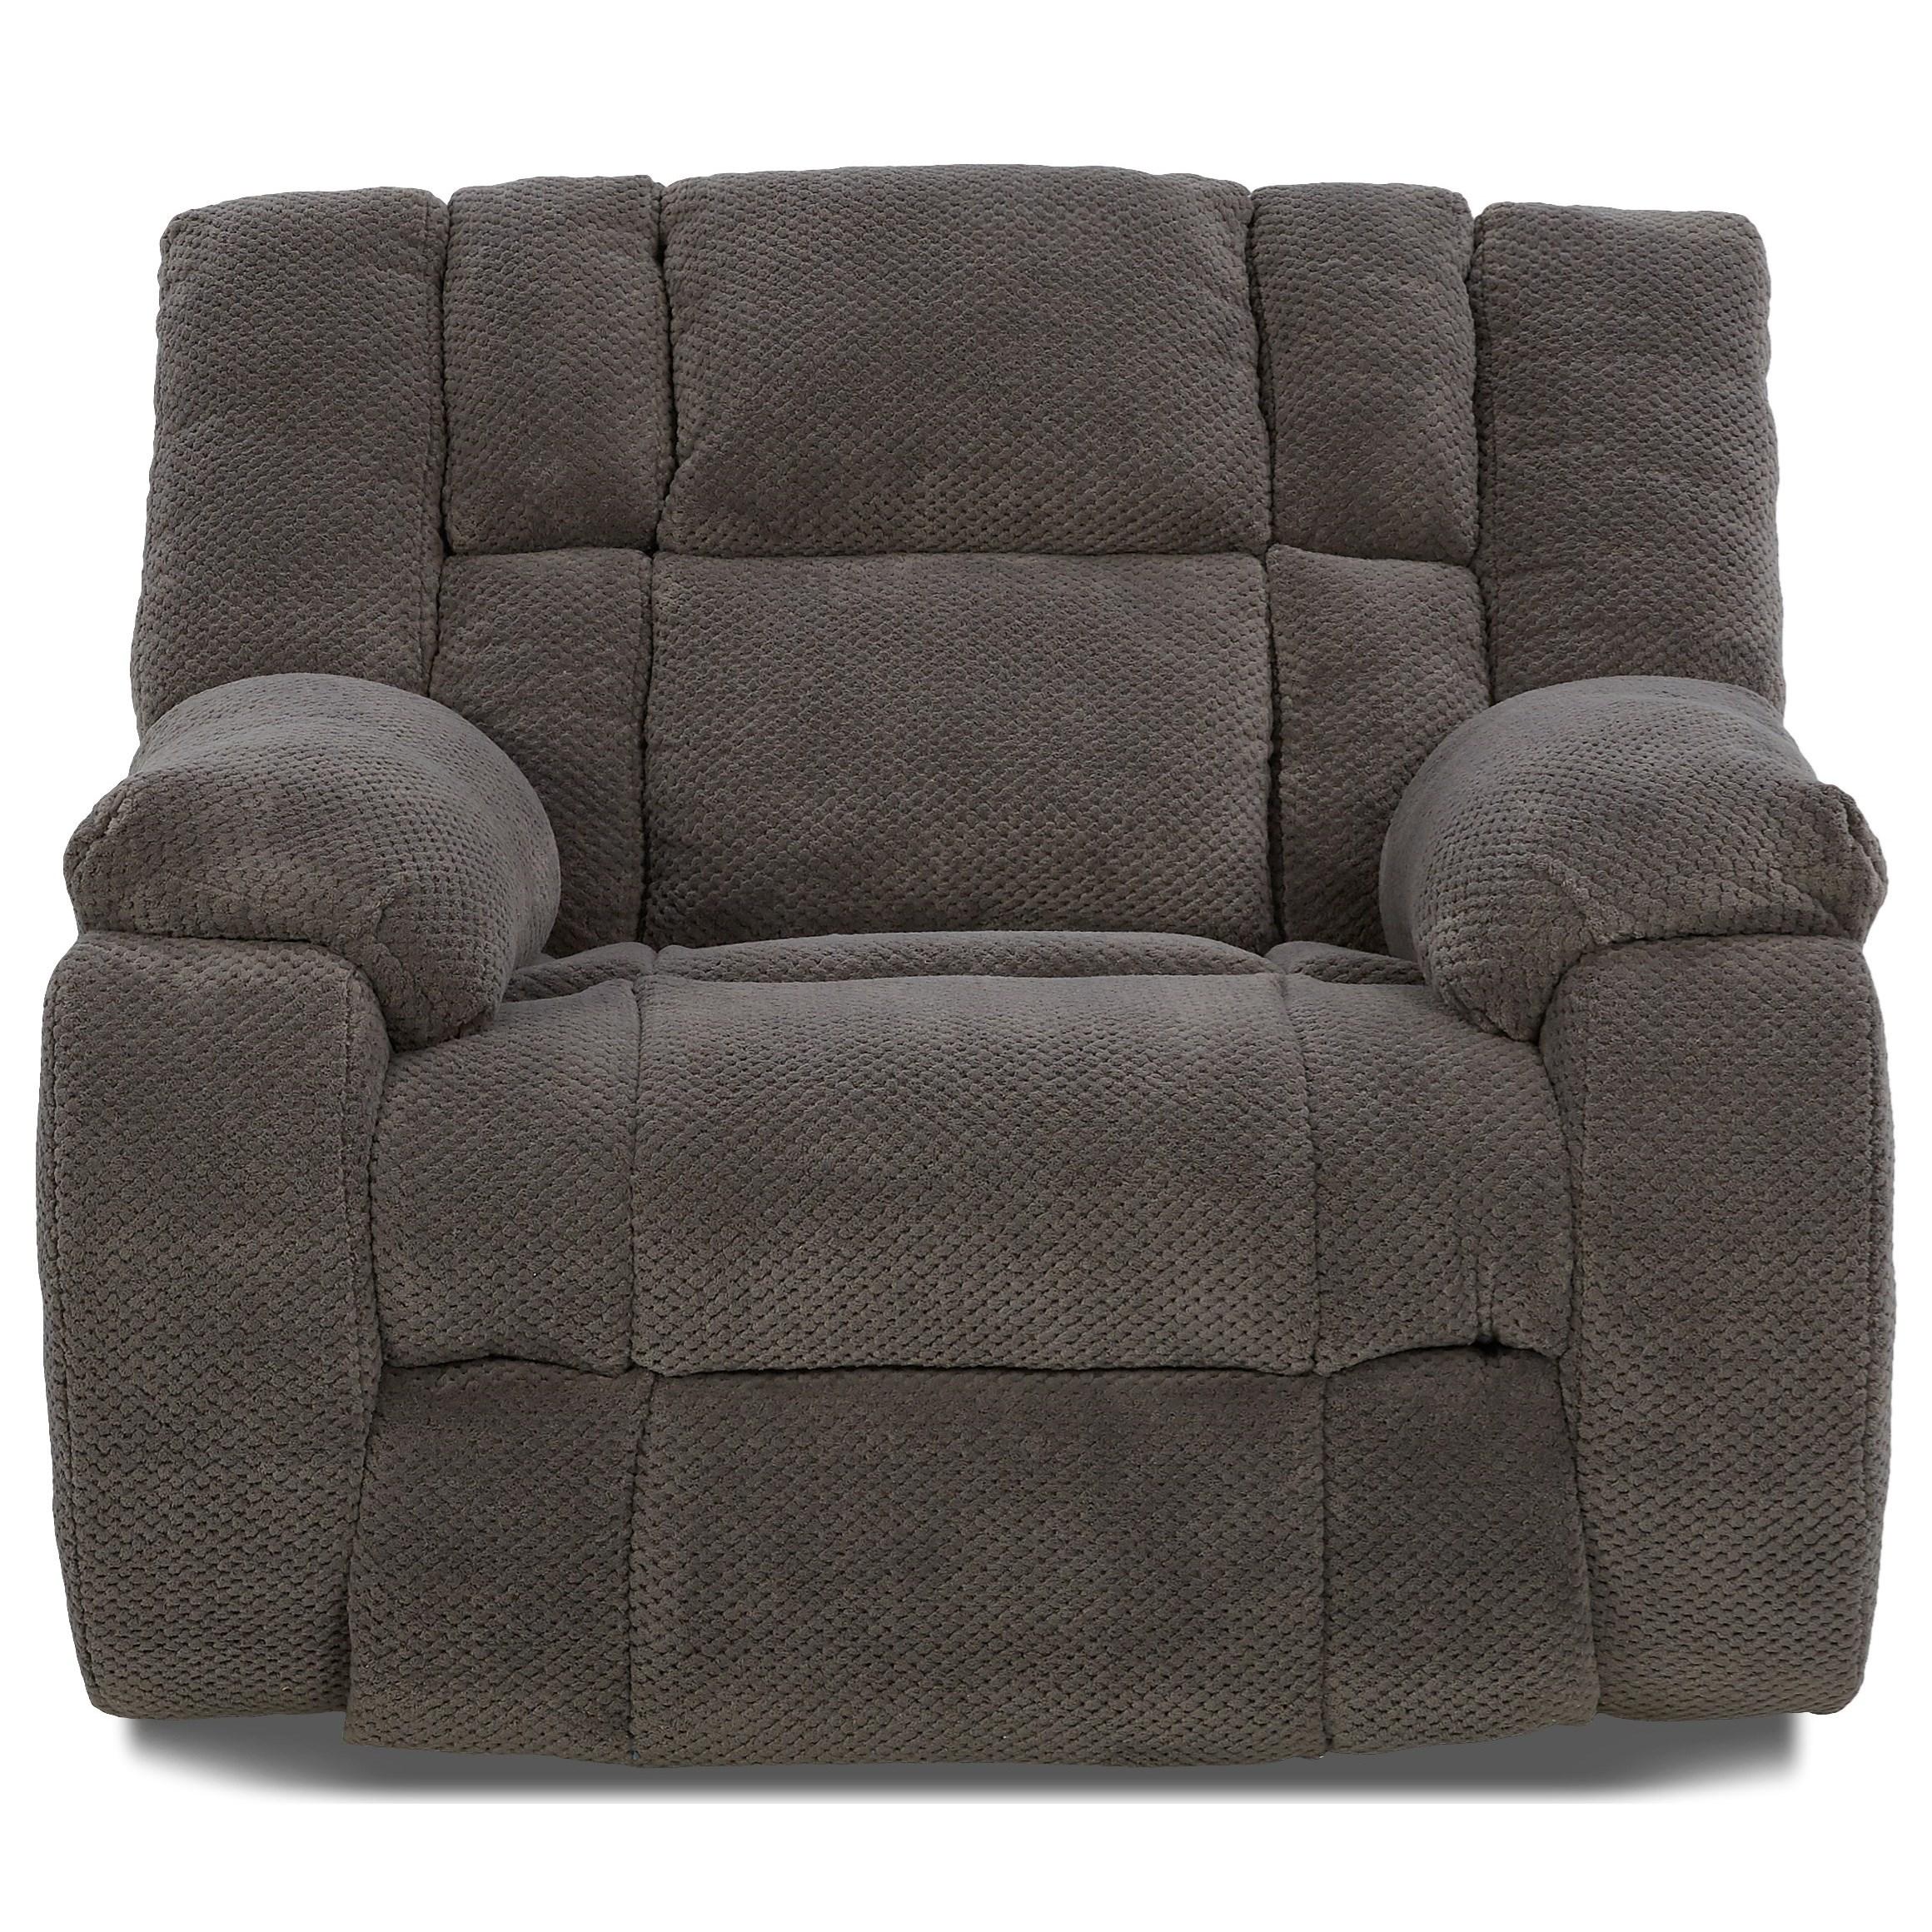 Klaussner Dozer Dozer Casual Reclining Chair Amp A Half